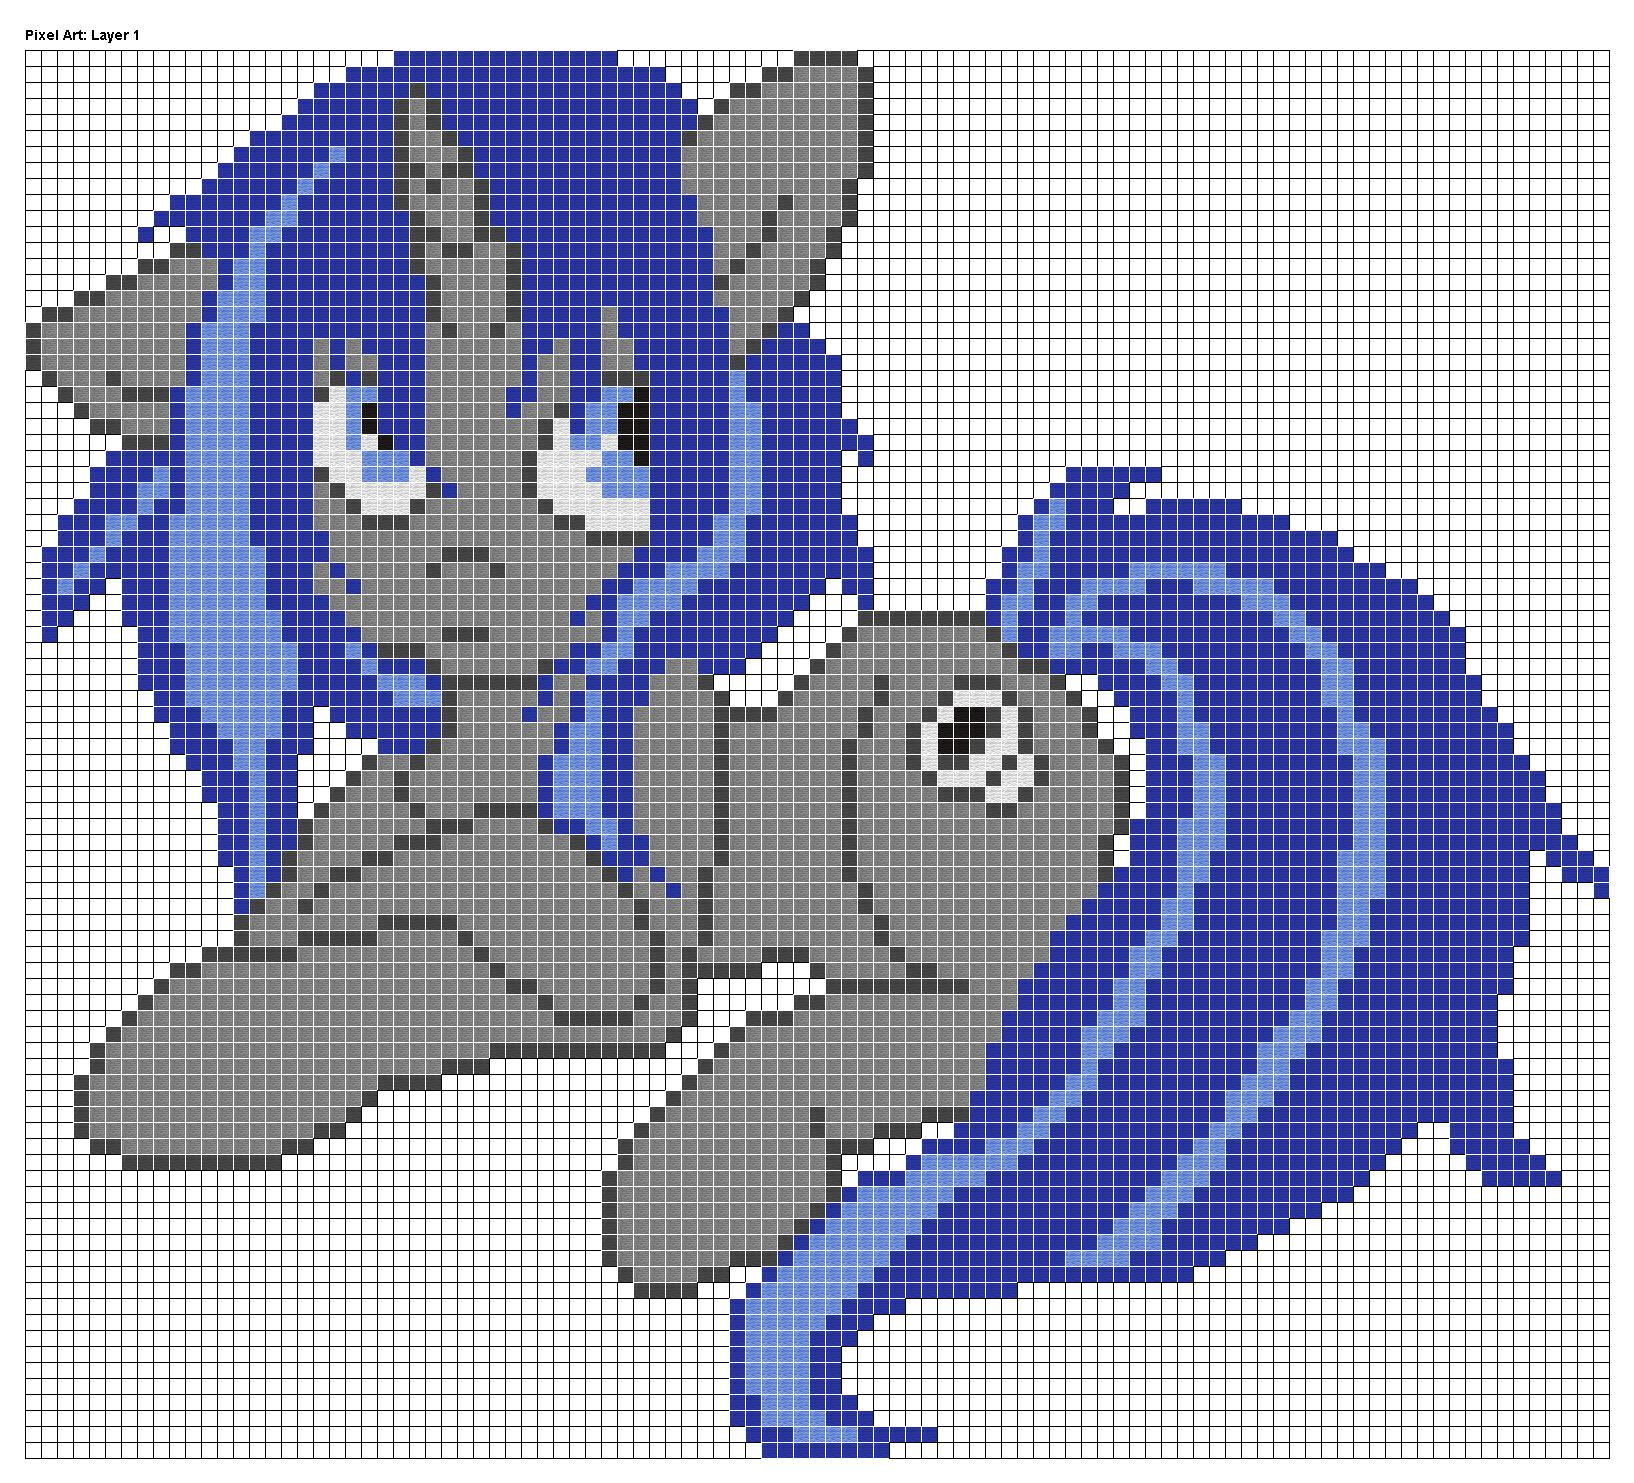 Fallout Equestria Homage Mc Pixel Art By Xxchippy13xx On Deviantart